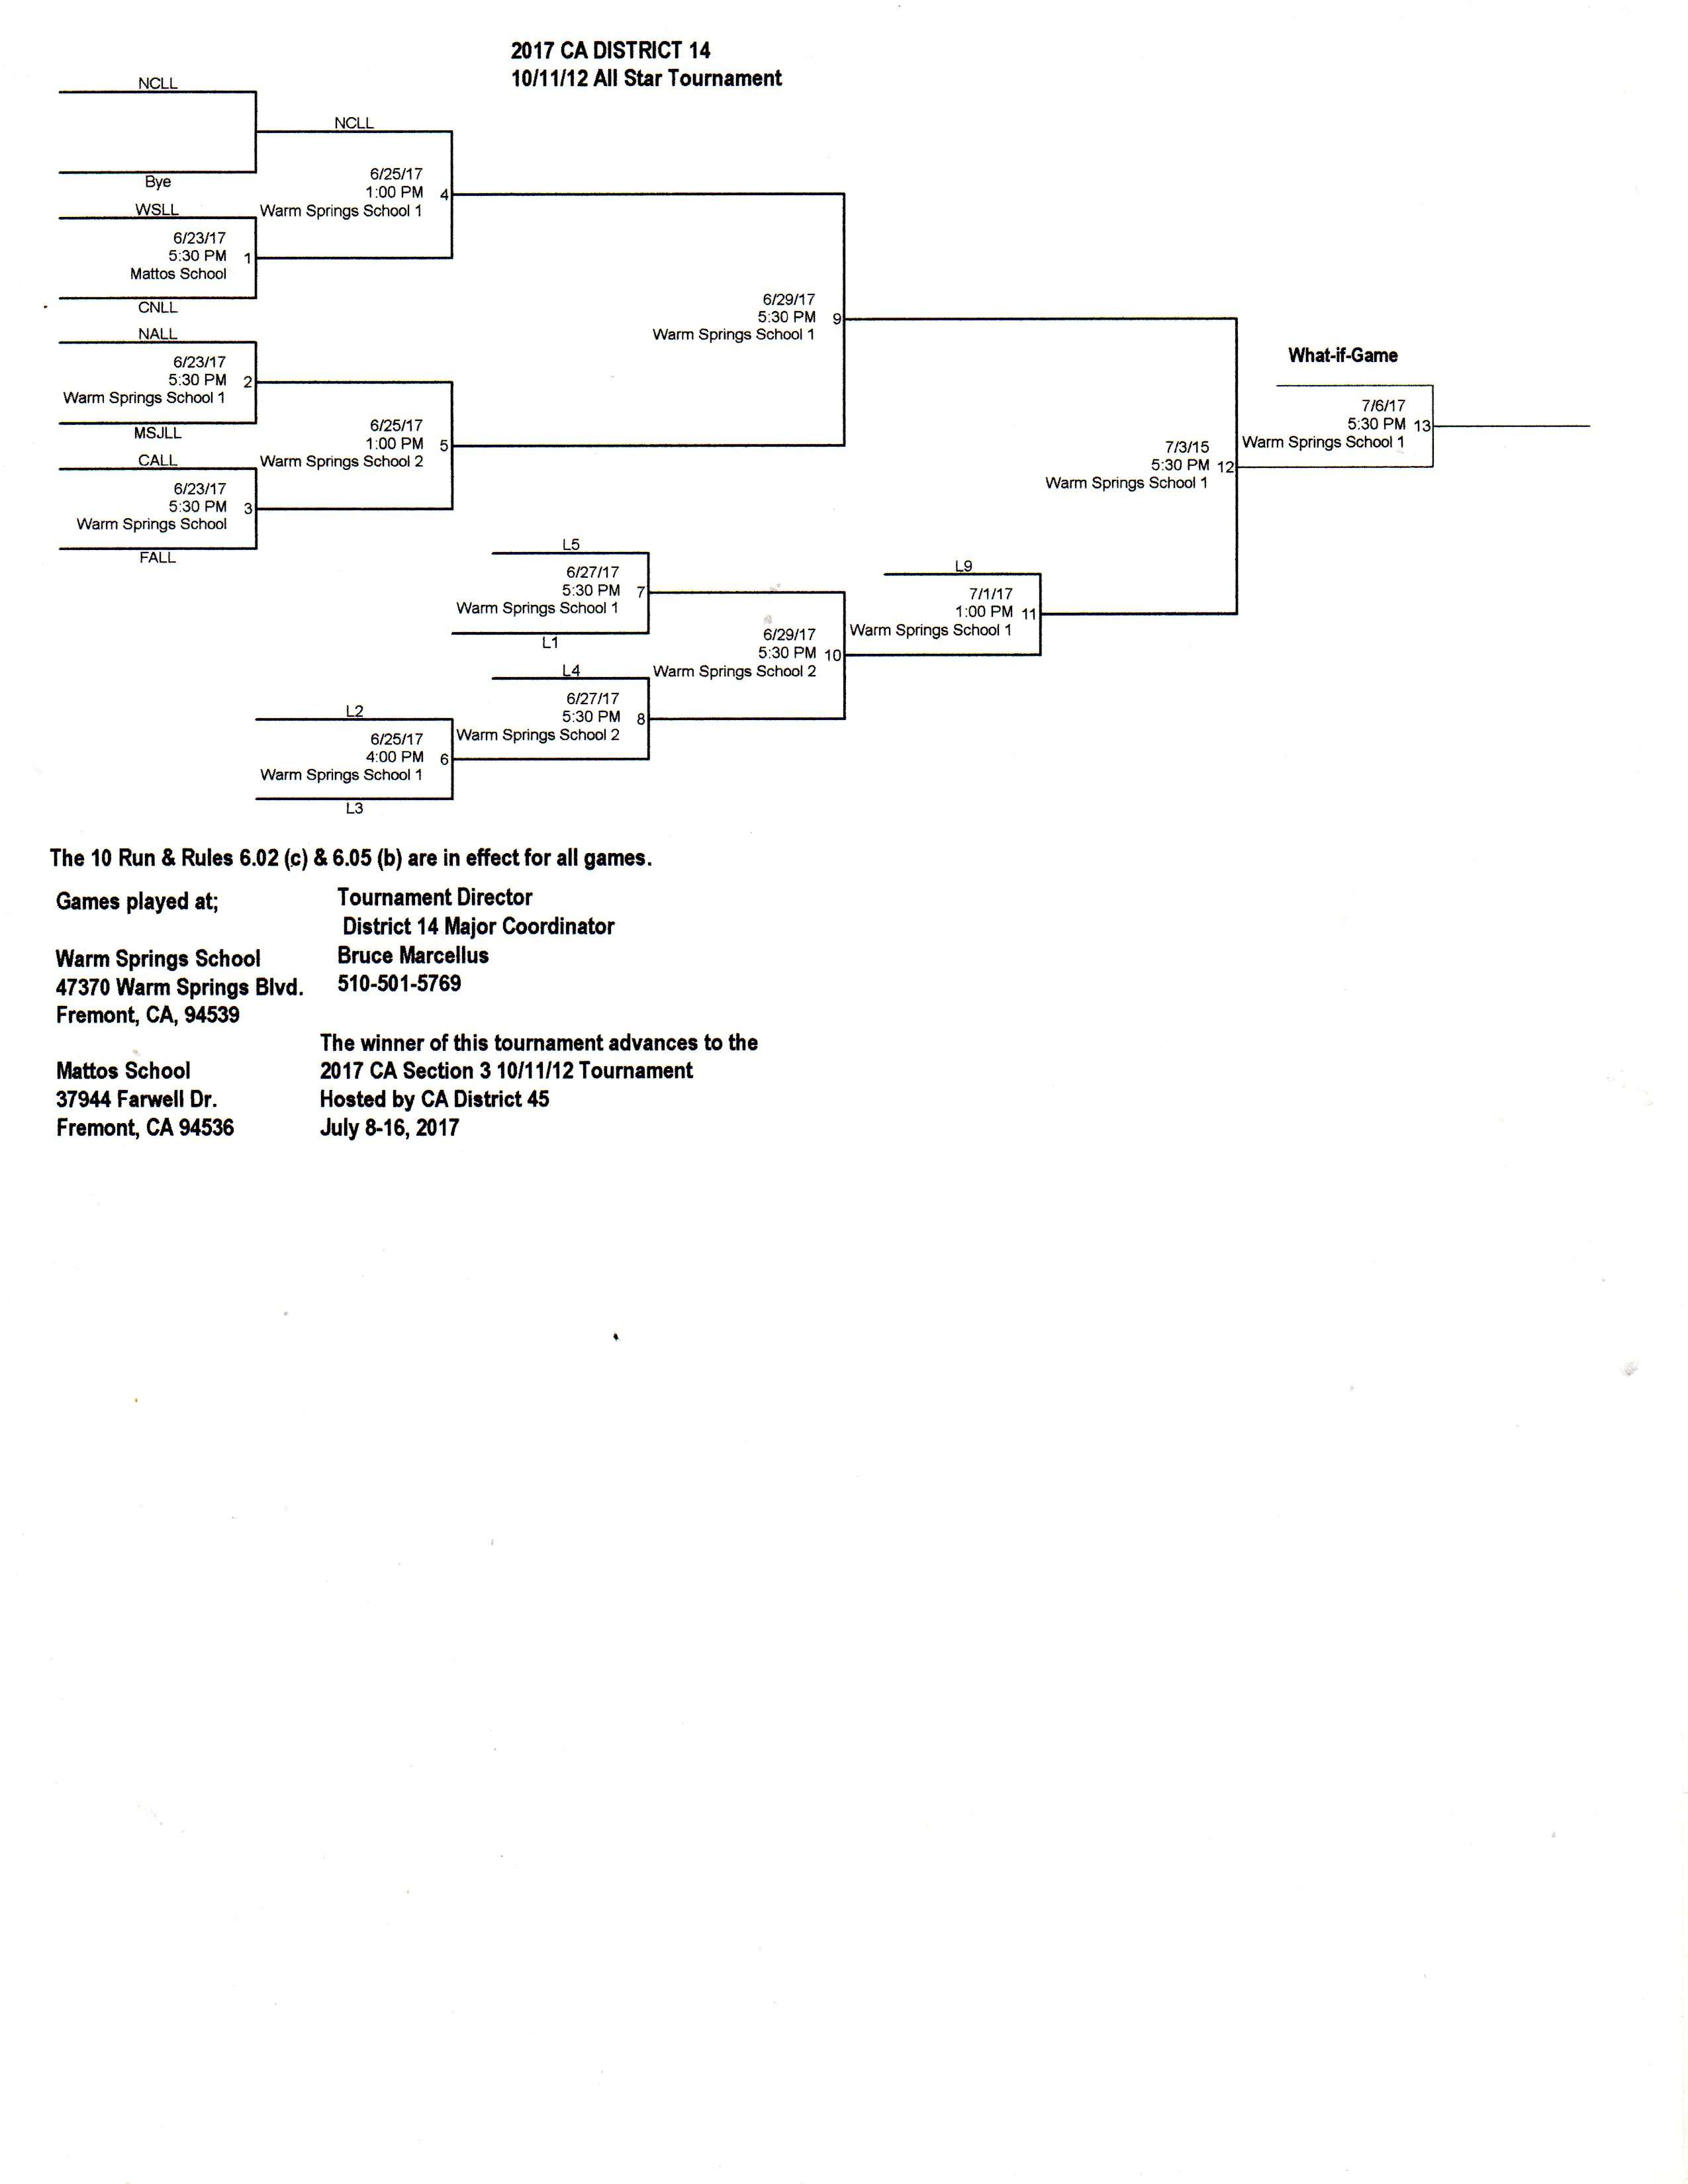 2017 CA District 14 10-11-12 Tournament